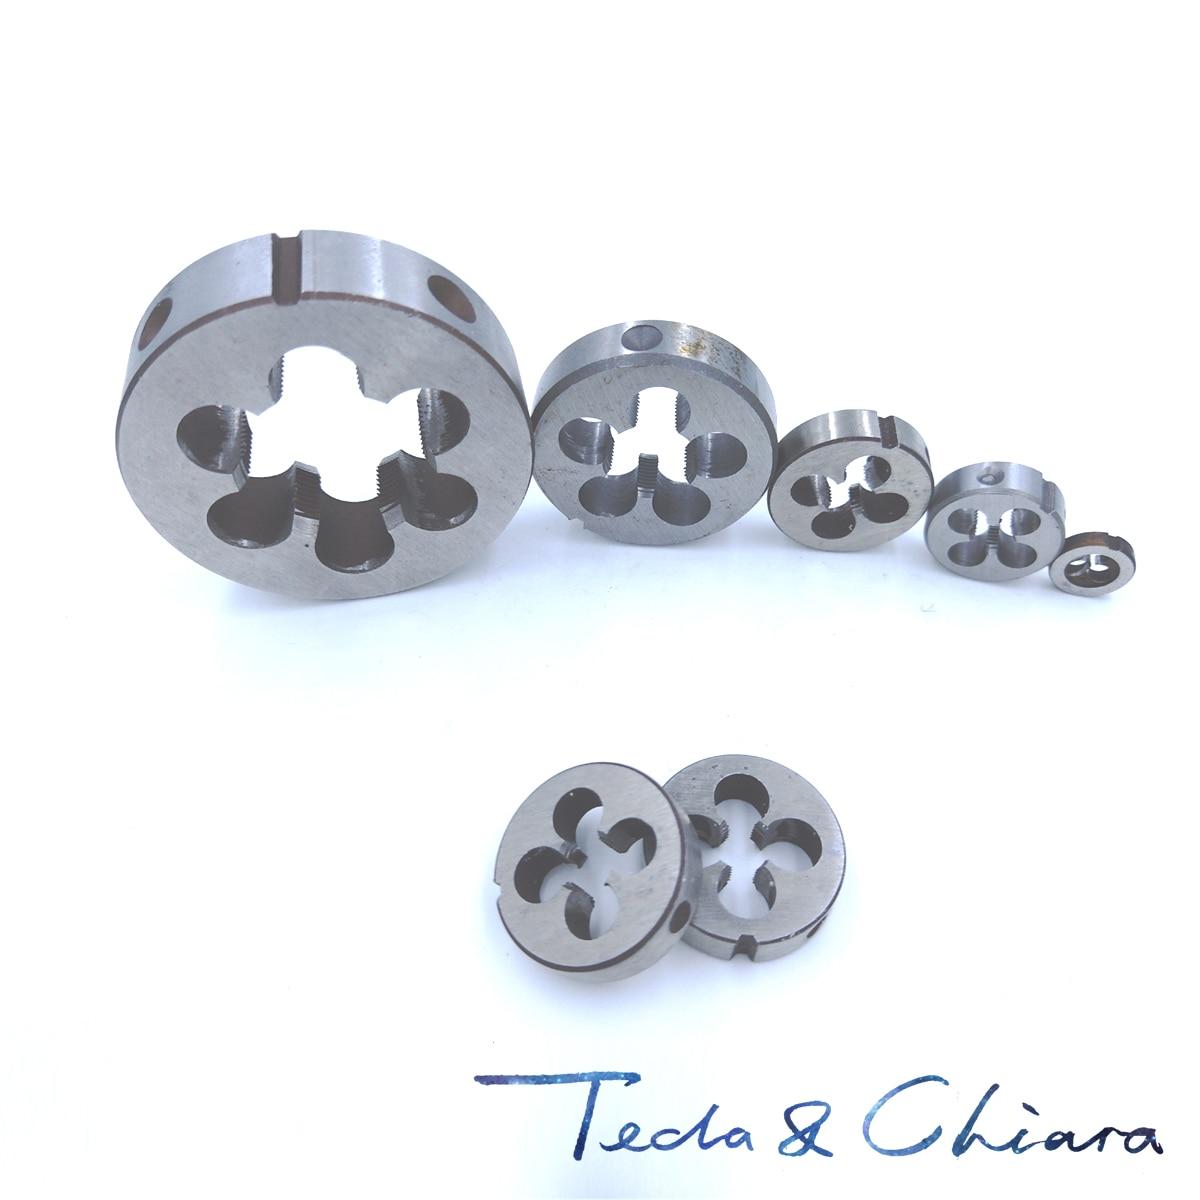 1pc Metric Left Machine Tap M8 X 1.25mm Tap Threading Tools 8mm X 1.25mm pitch